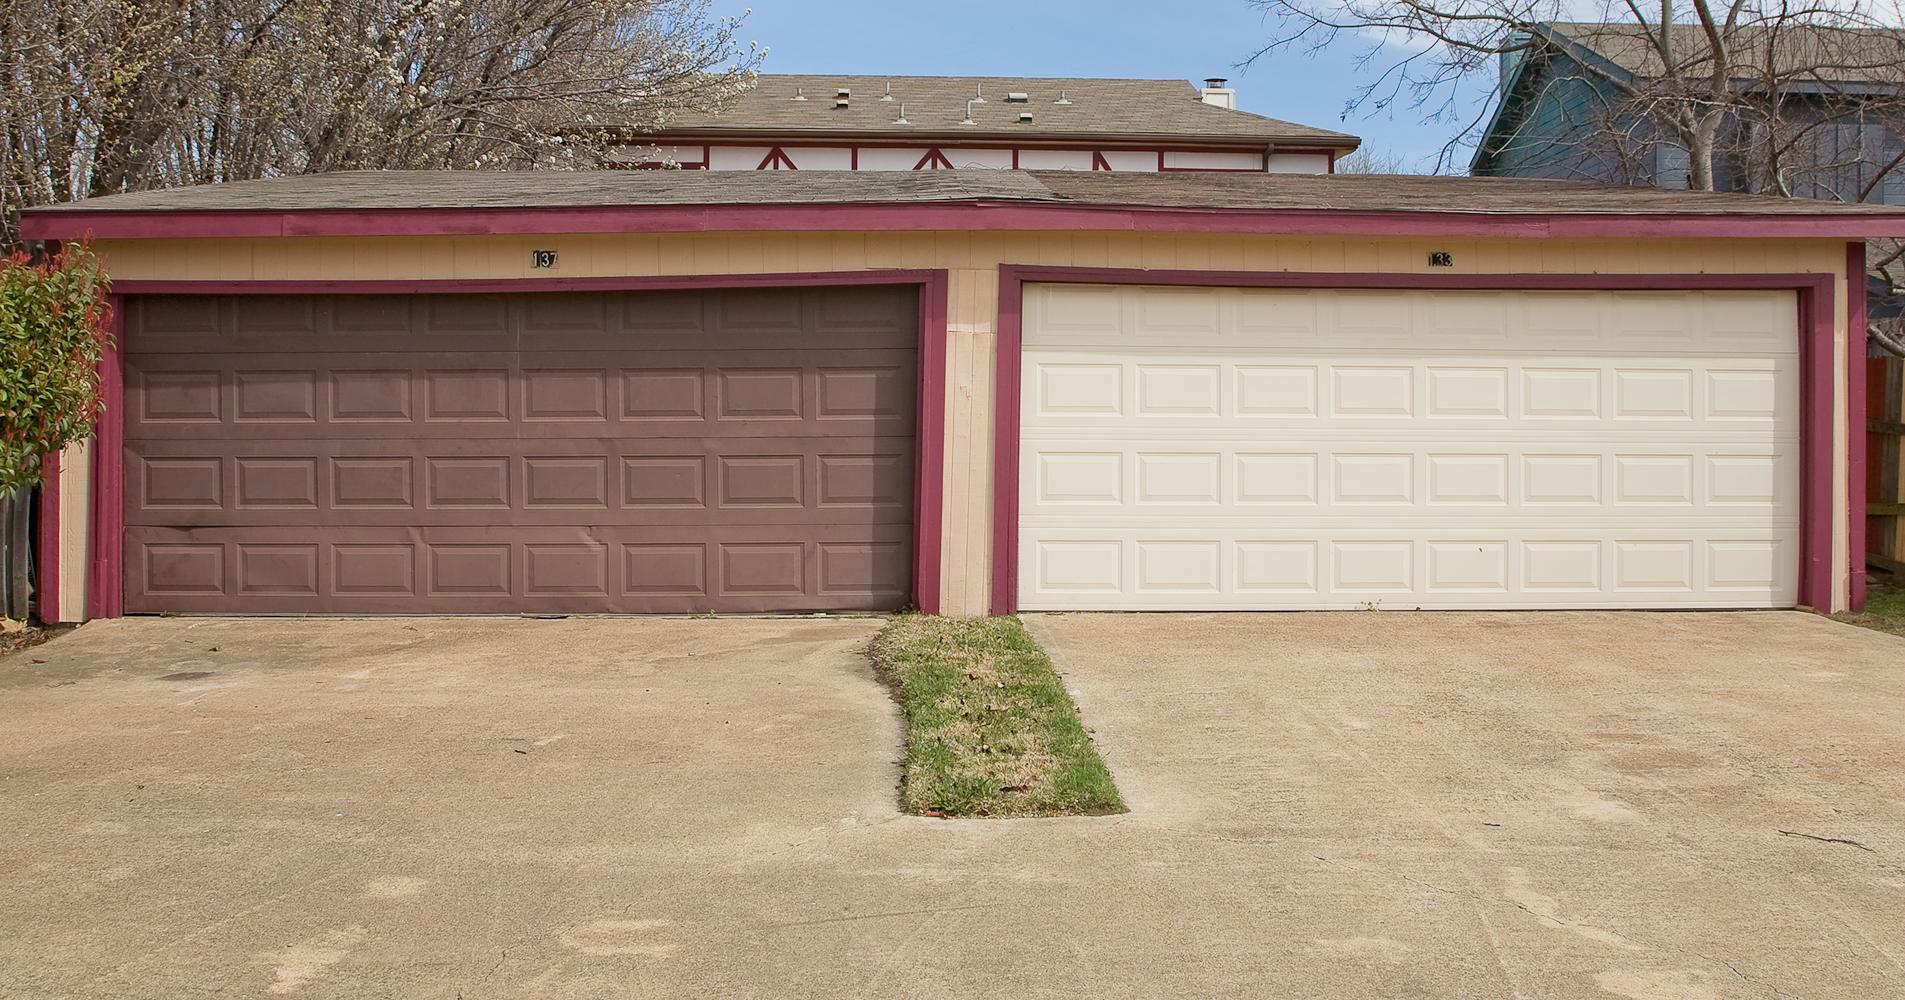 Duplex Homes 2 (1 of 9).jpg